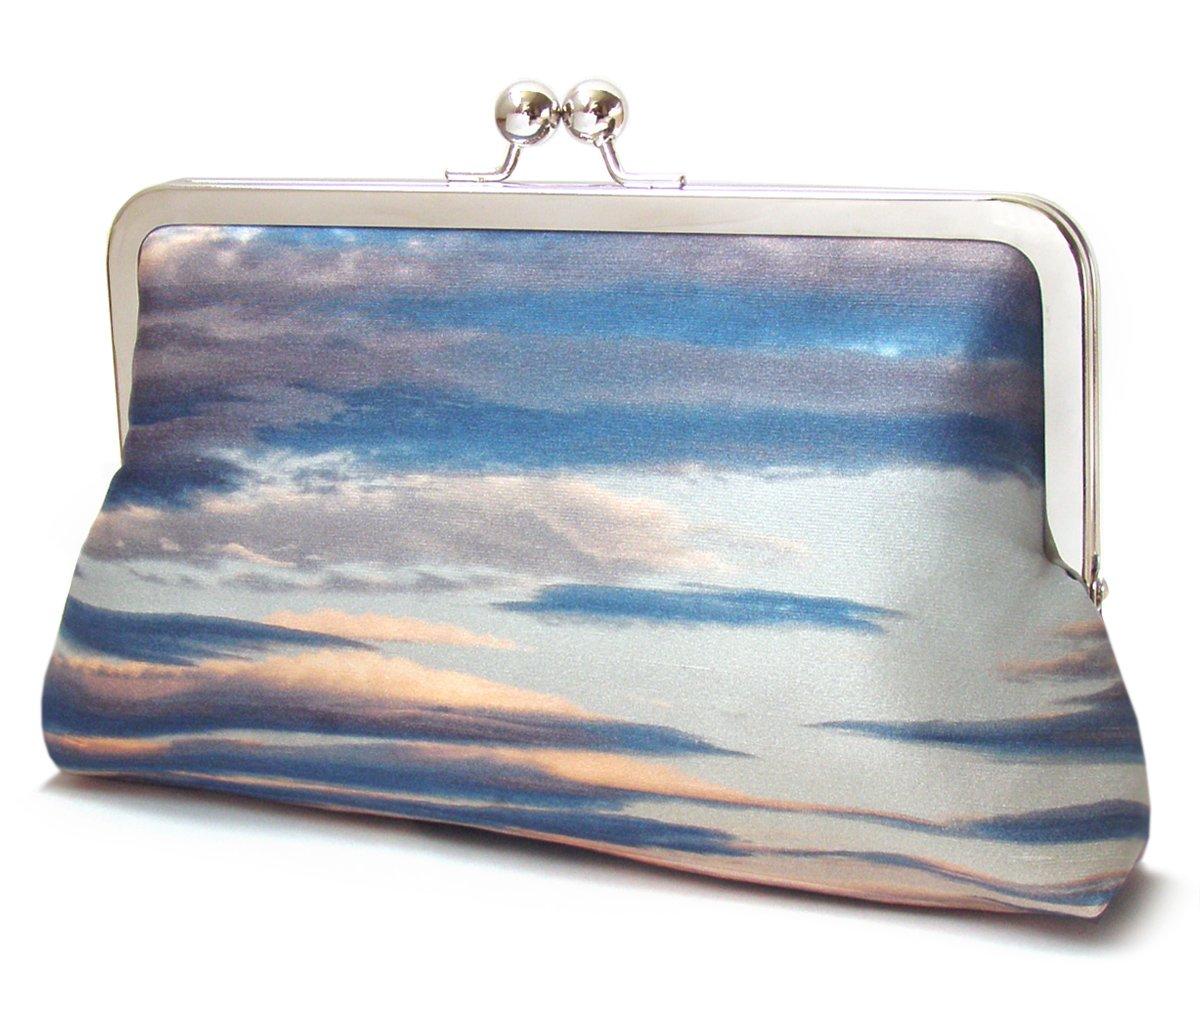 Image of Clouds clutch purse, silk sunset bag, blue stripe sky